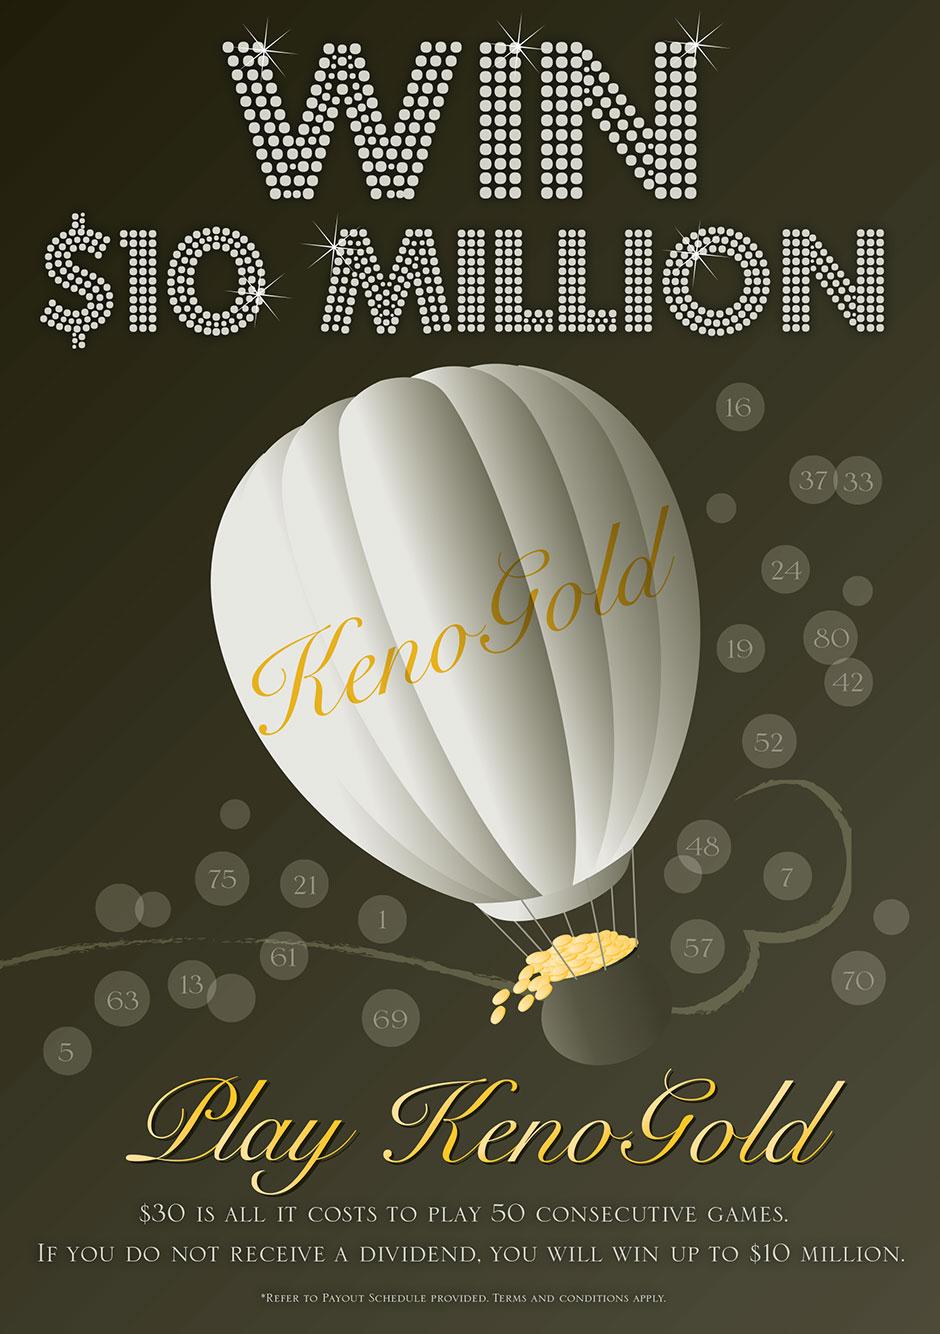 Keno Gold Poster | Illustration | Graphic Design | www.tickledpinkconfetti.com.au | by Veronika Kahrmadji